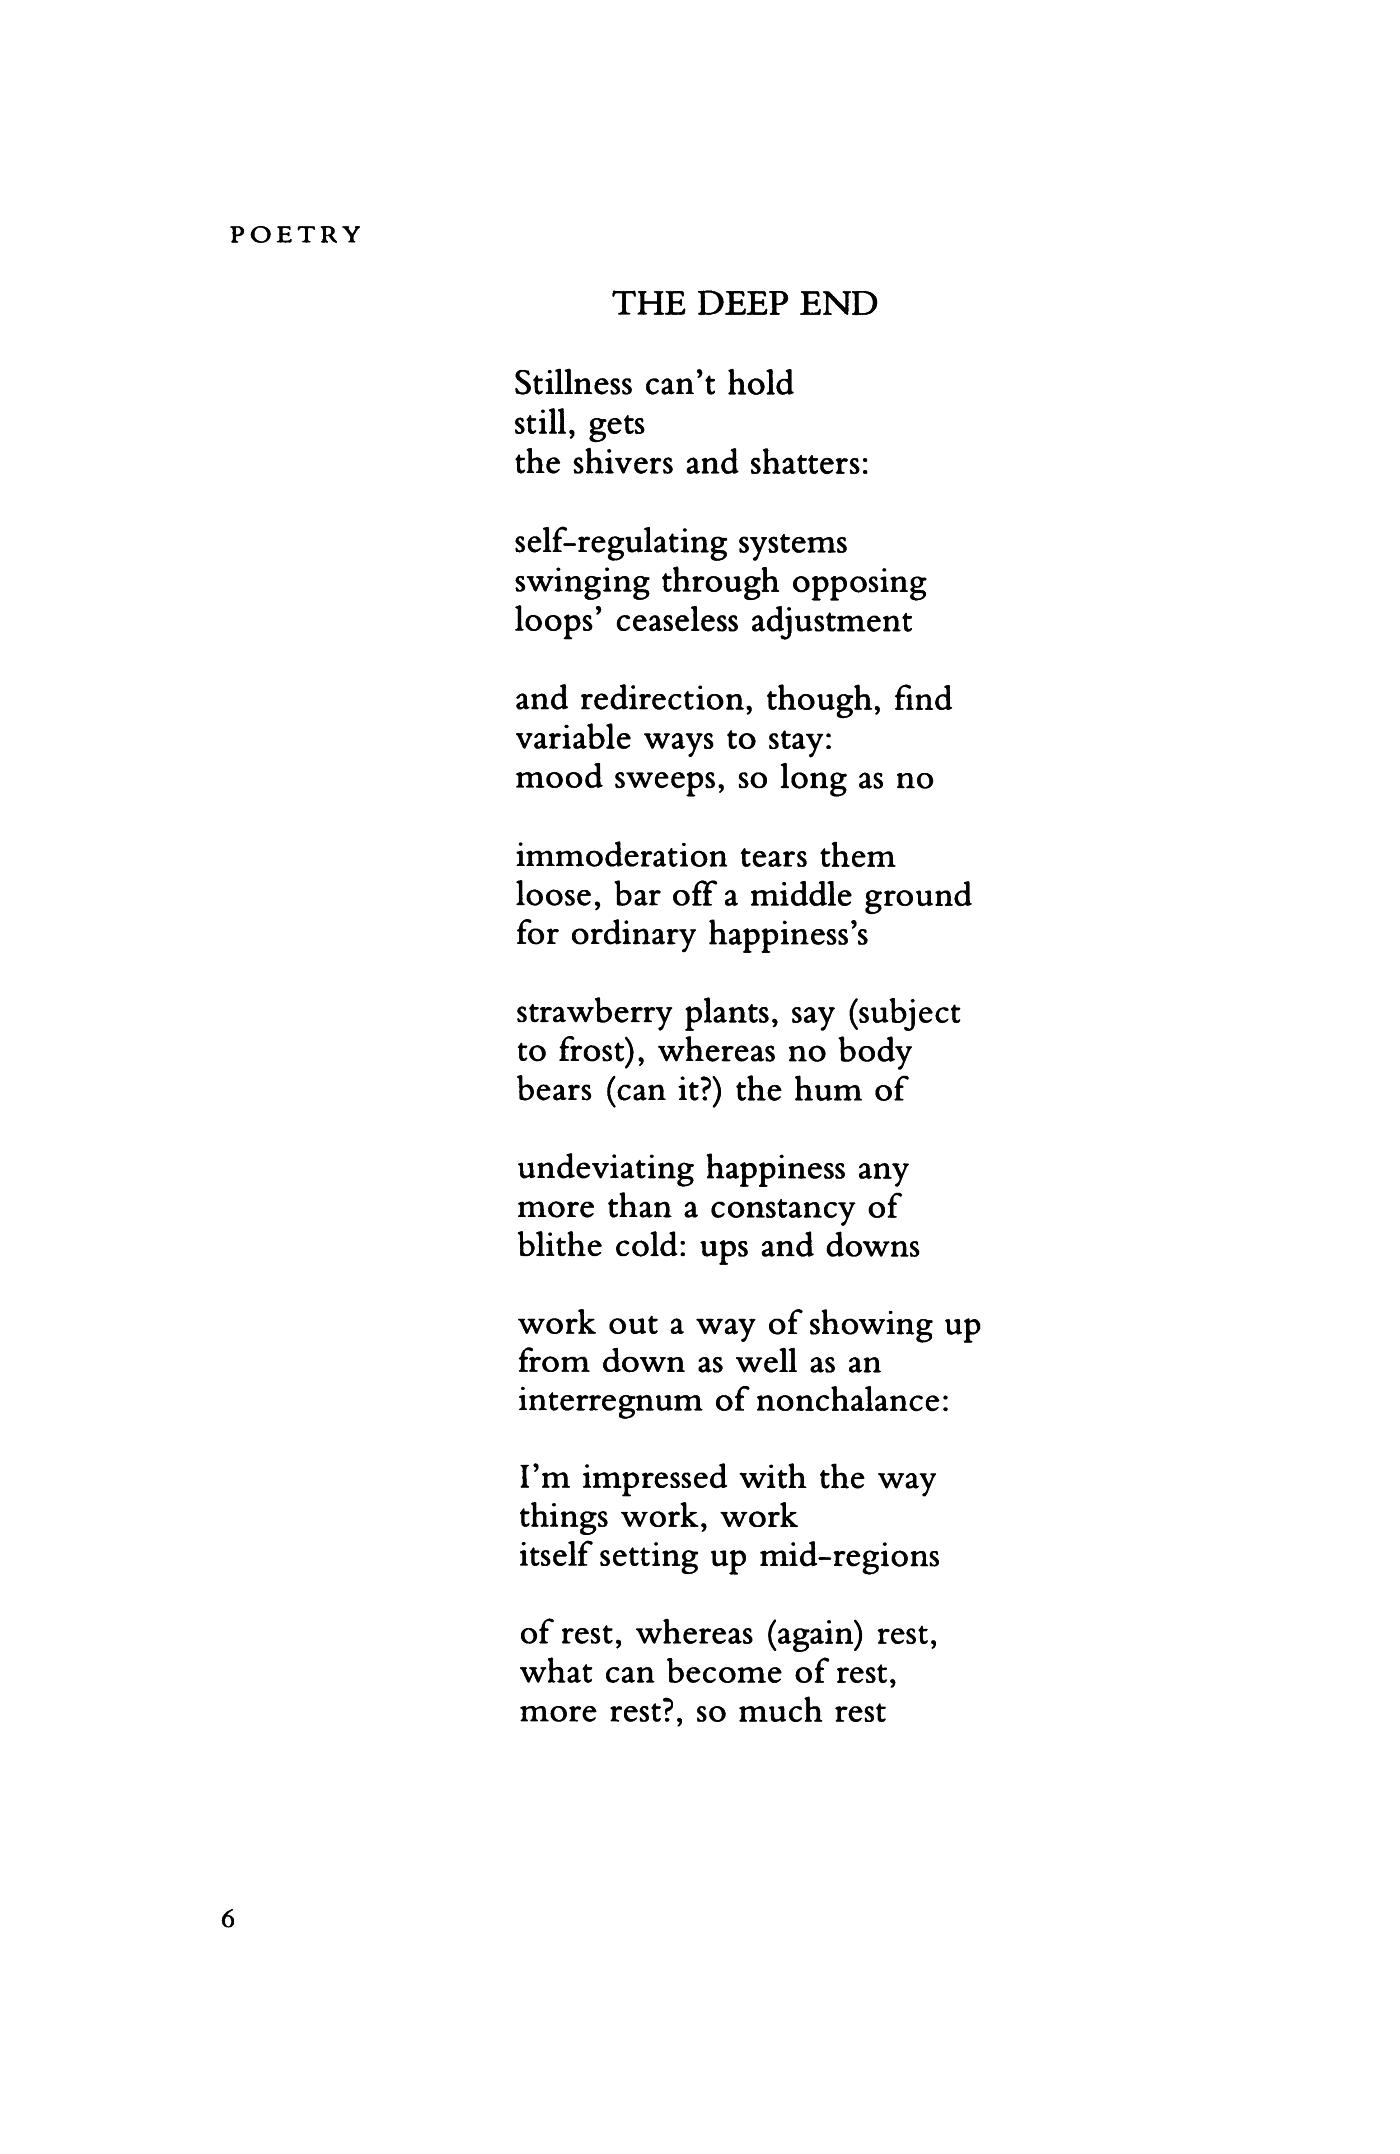 how do you end a poem